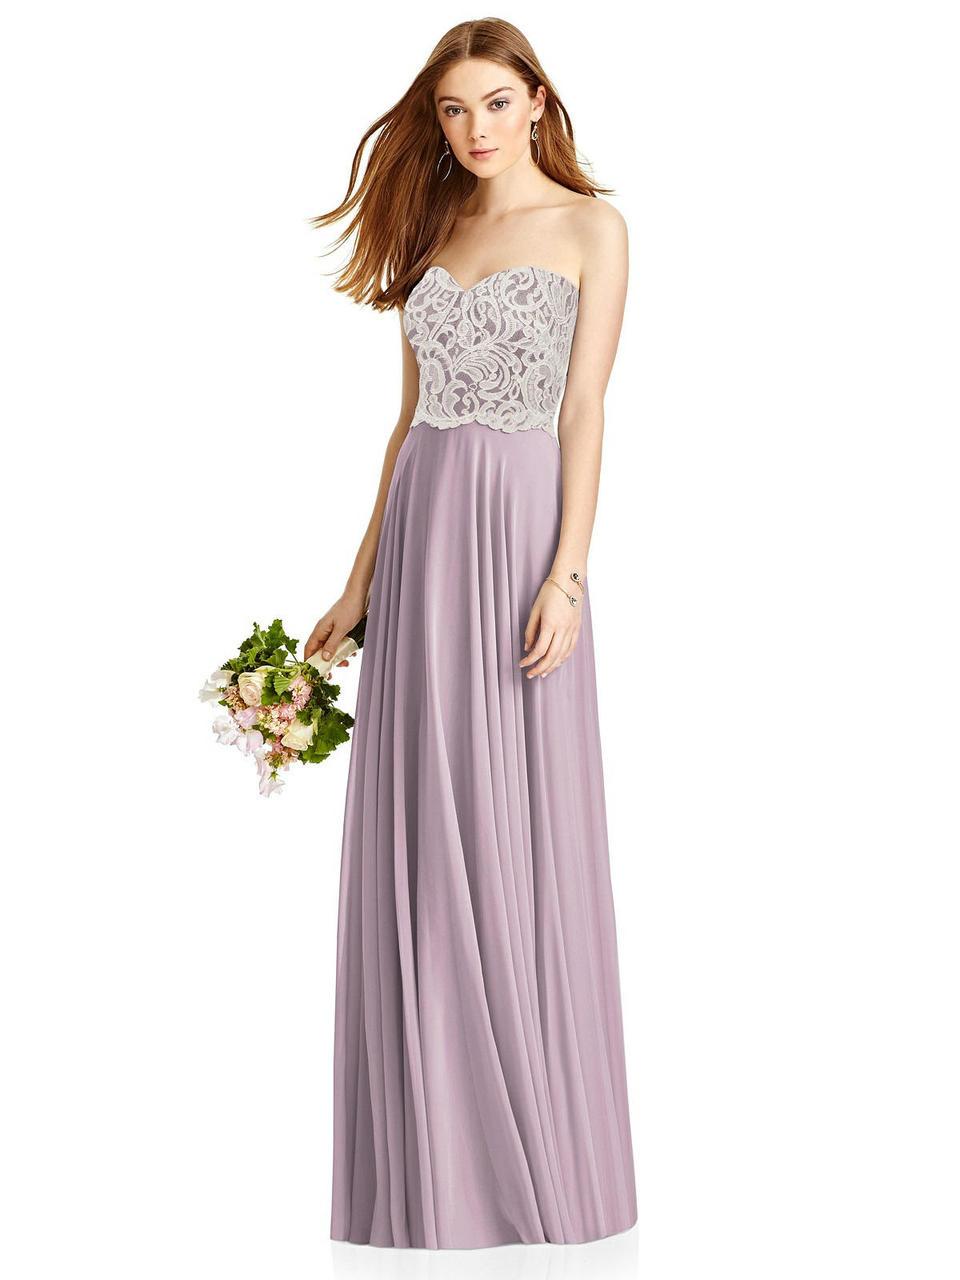 Studio Design Shimmer Bridesmaid Dress 4504